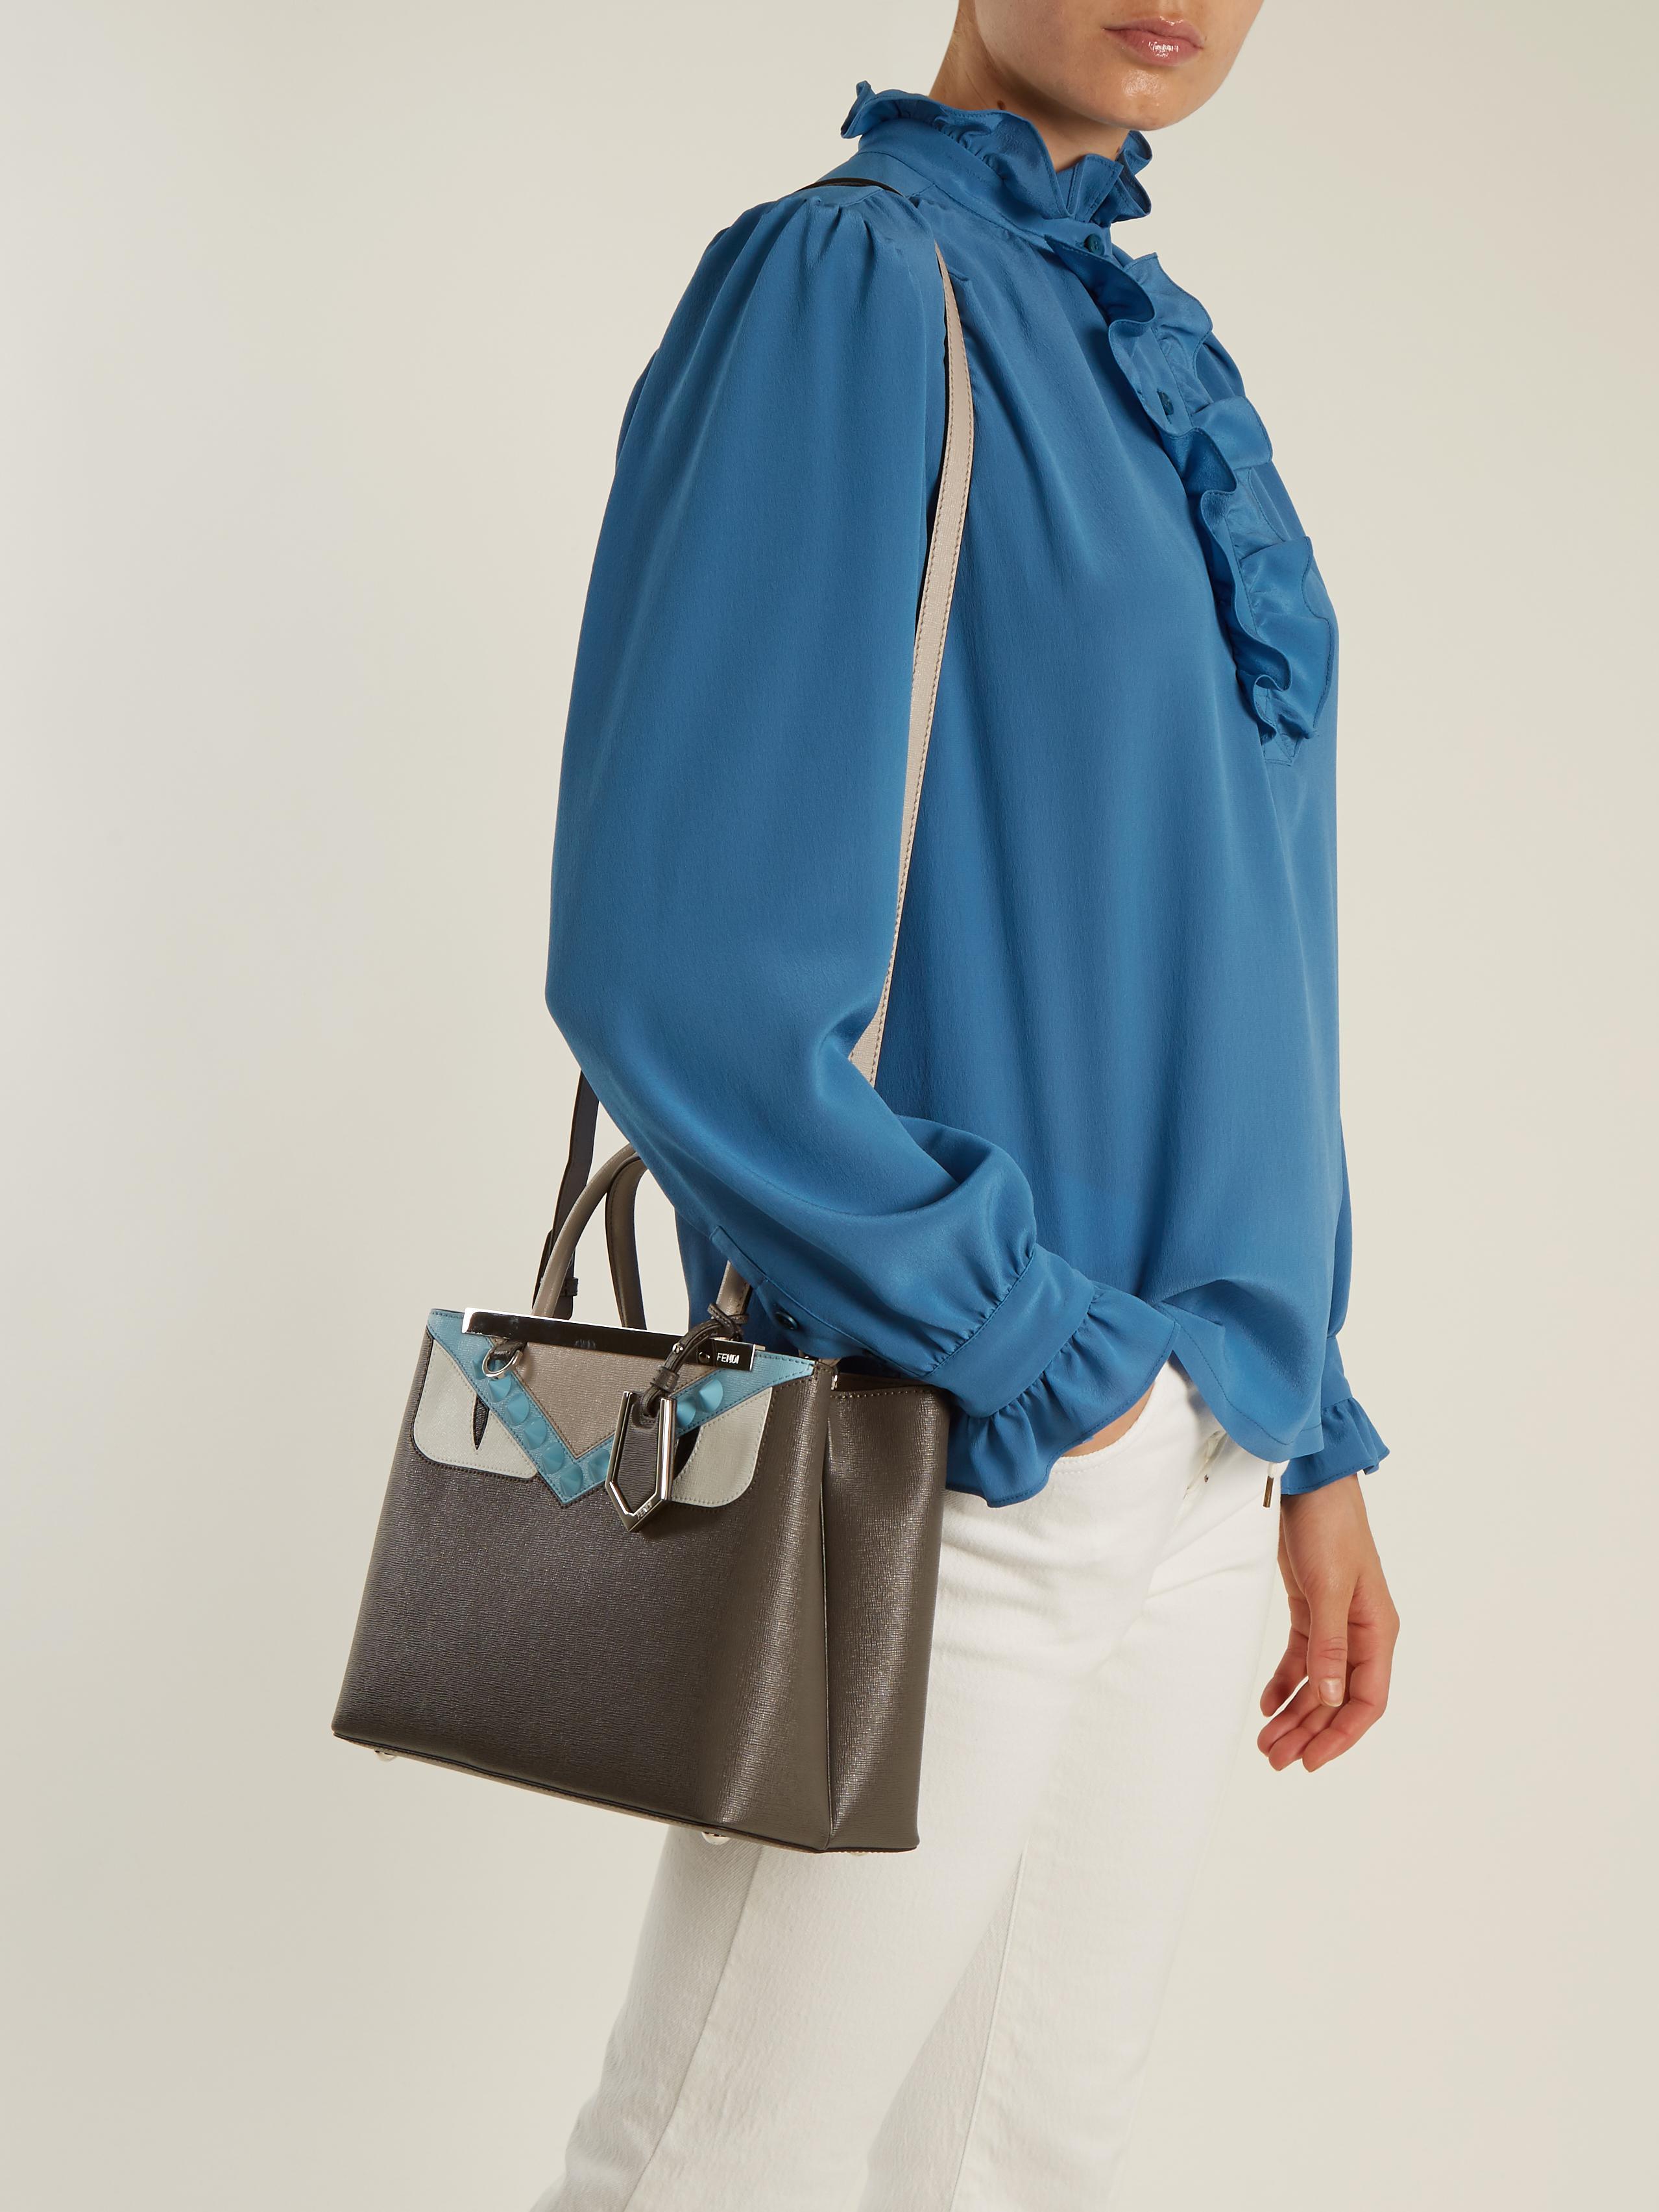 7b51001768 Gallery. Previously sold at  MATCHESFASHION.COM · Women s Fendi 2jours  Women s Fendi Bag Bugs ...